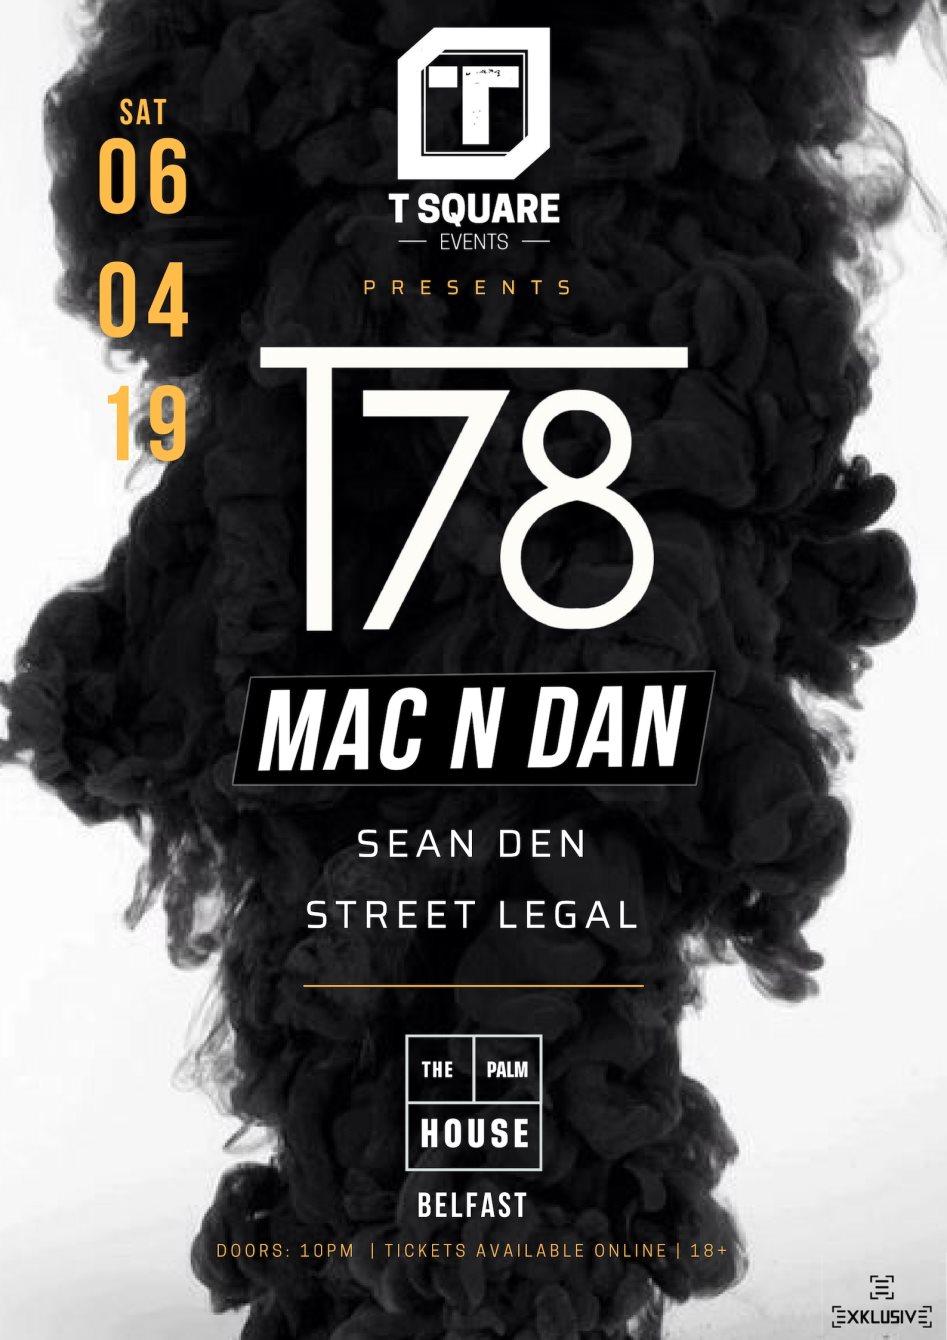 RA: T SQUARE presents T78, Mac N Dan, Sean Den, Street Legal at The